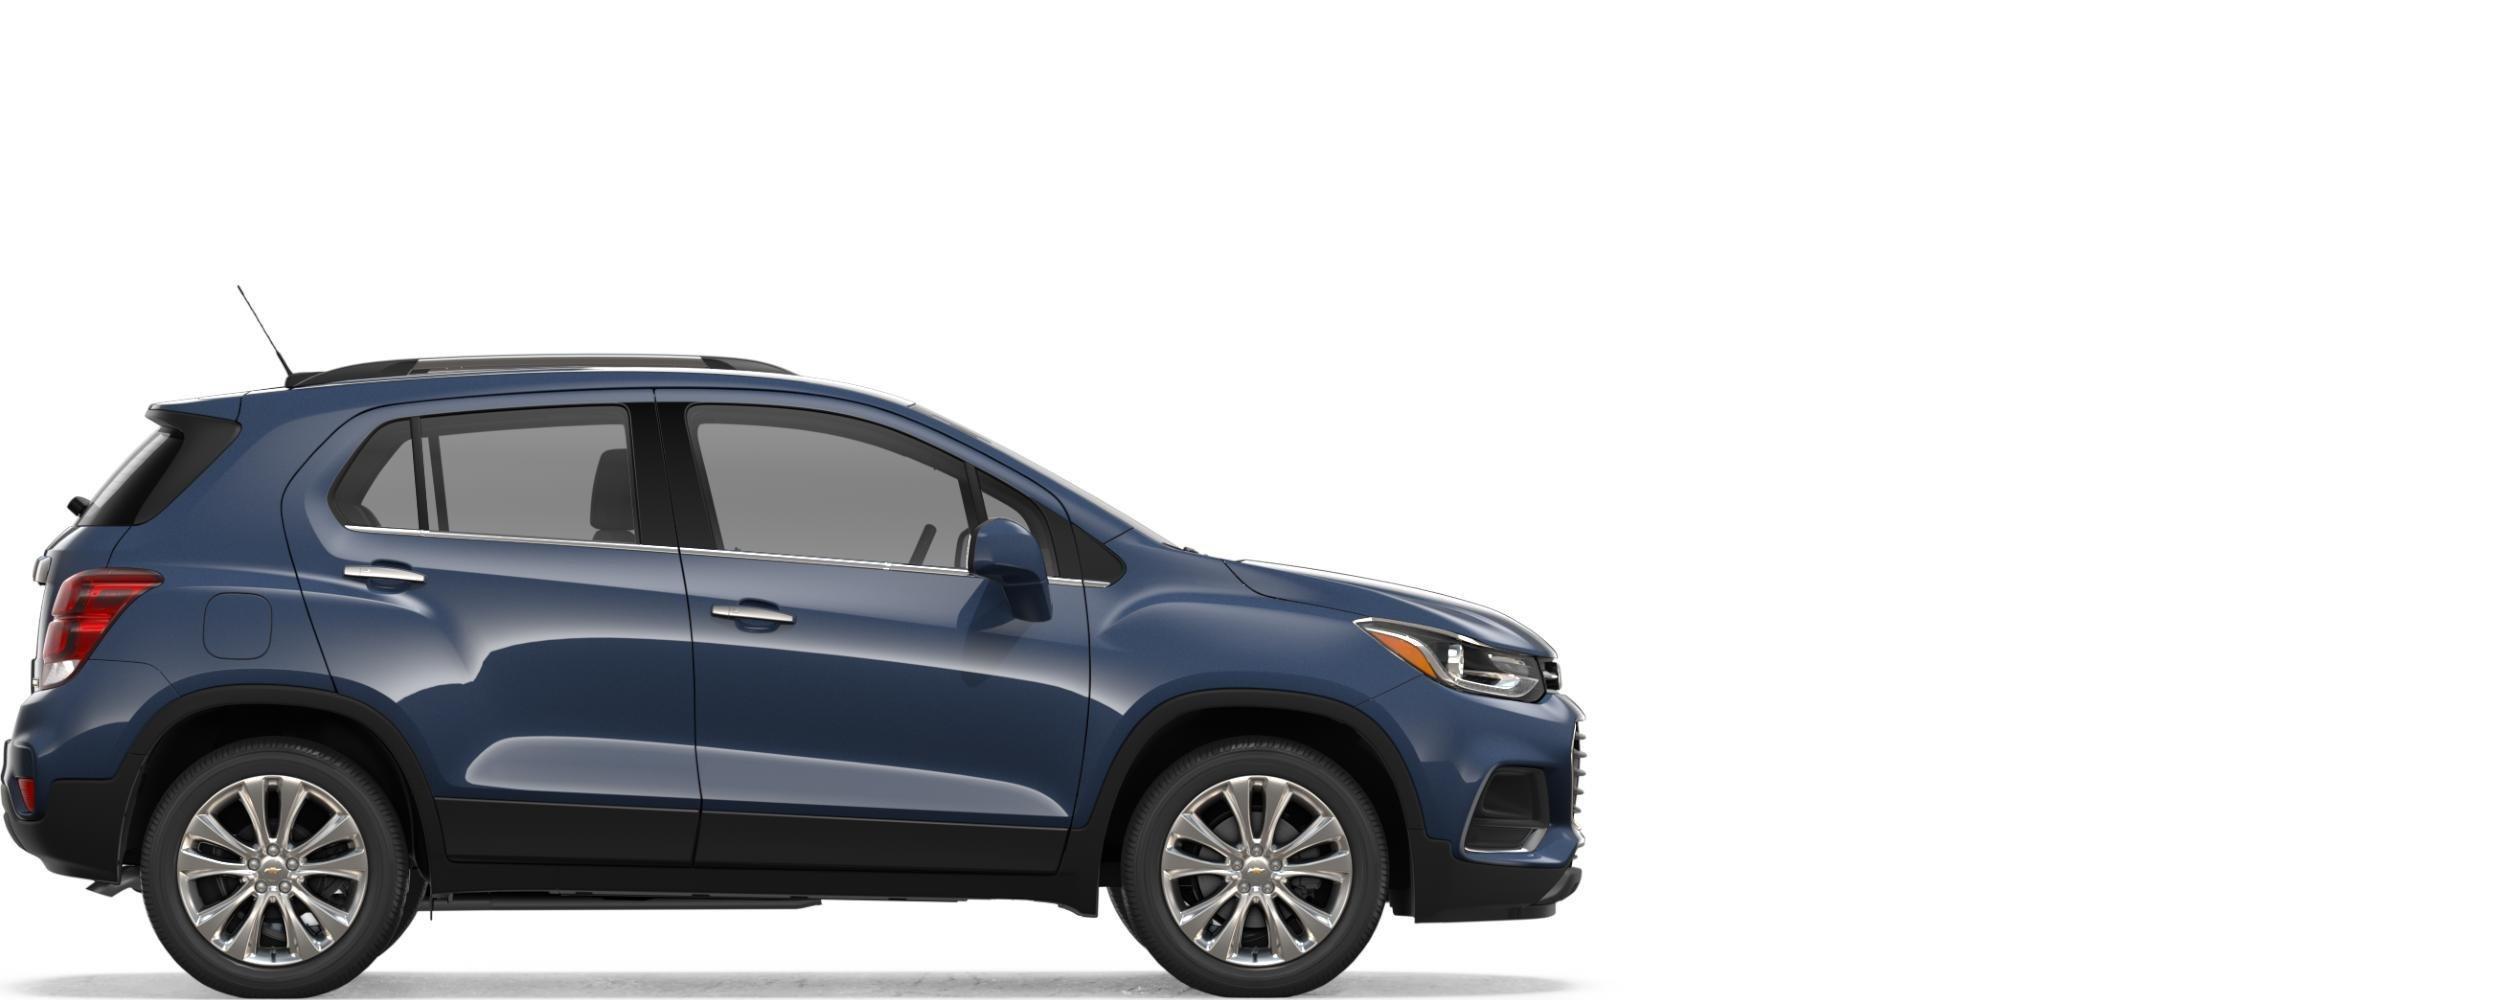 Matthews-Hargreaves Chevrolet Royal Oak, MI | New & Used Cars